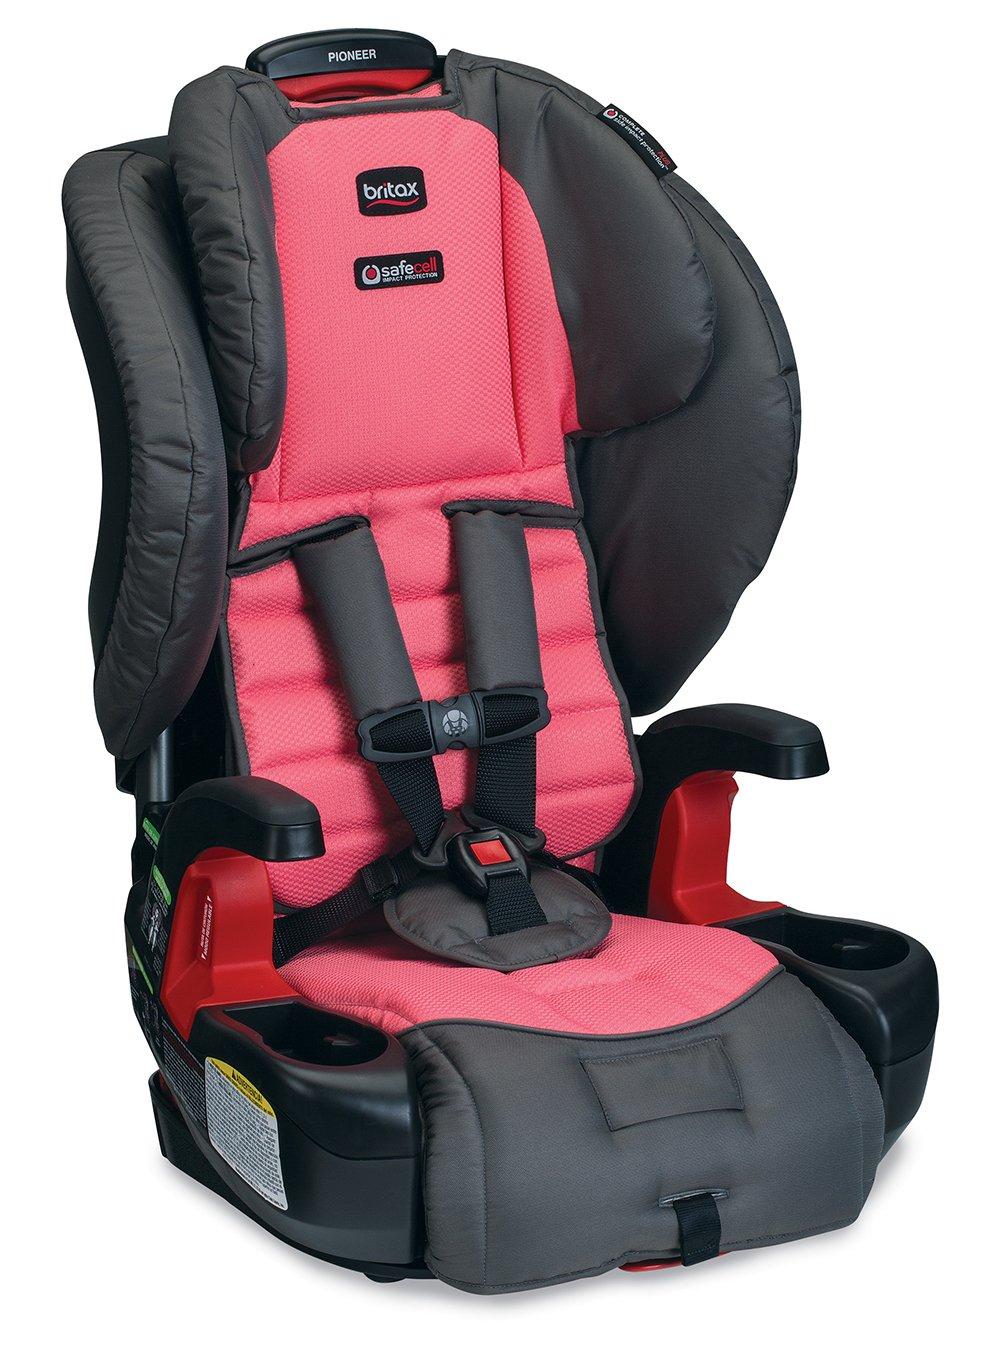 Amazon.com : Britax Pioneer G1.1 Harness-2-Booster Car Seat, Coral ...